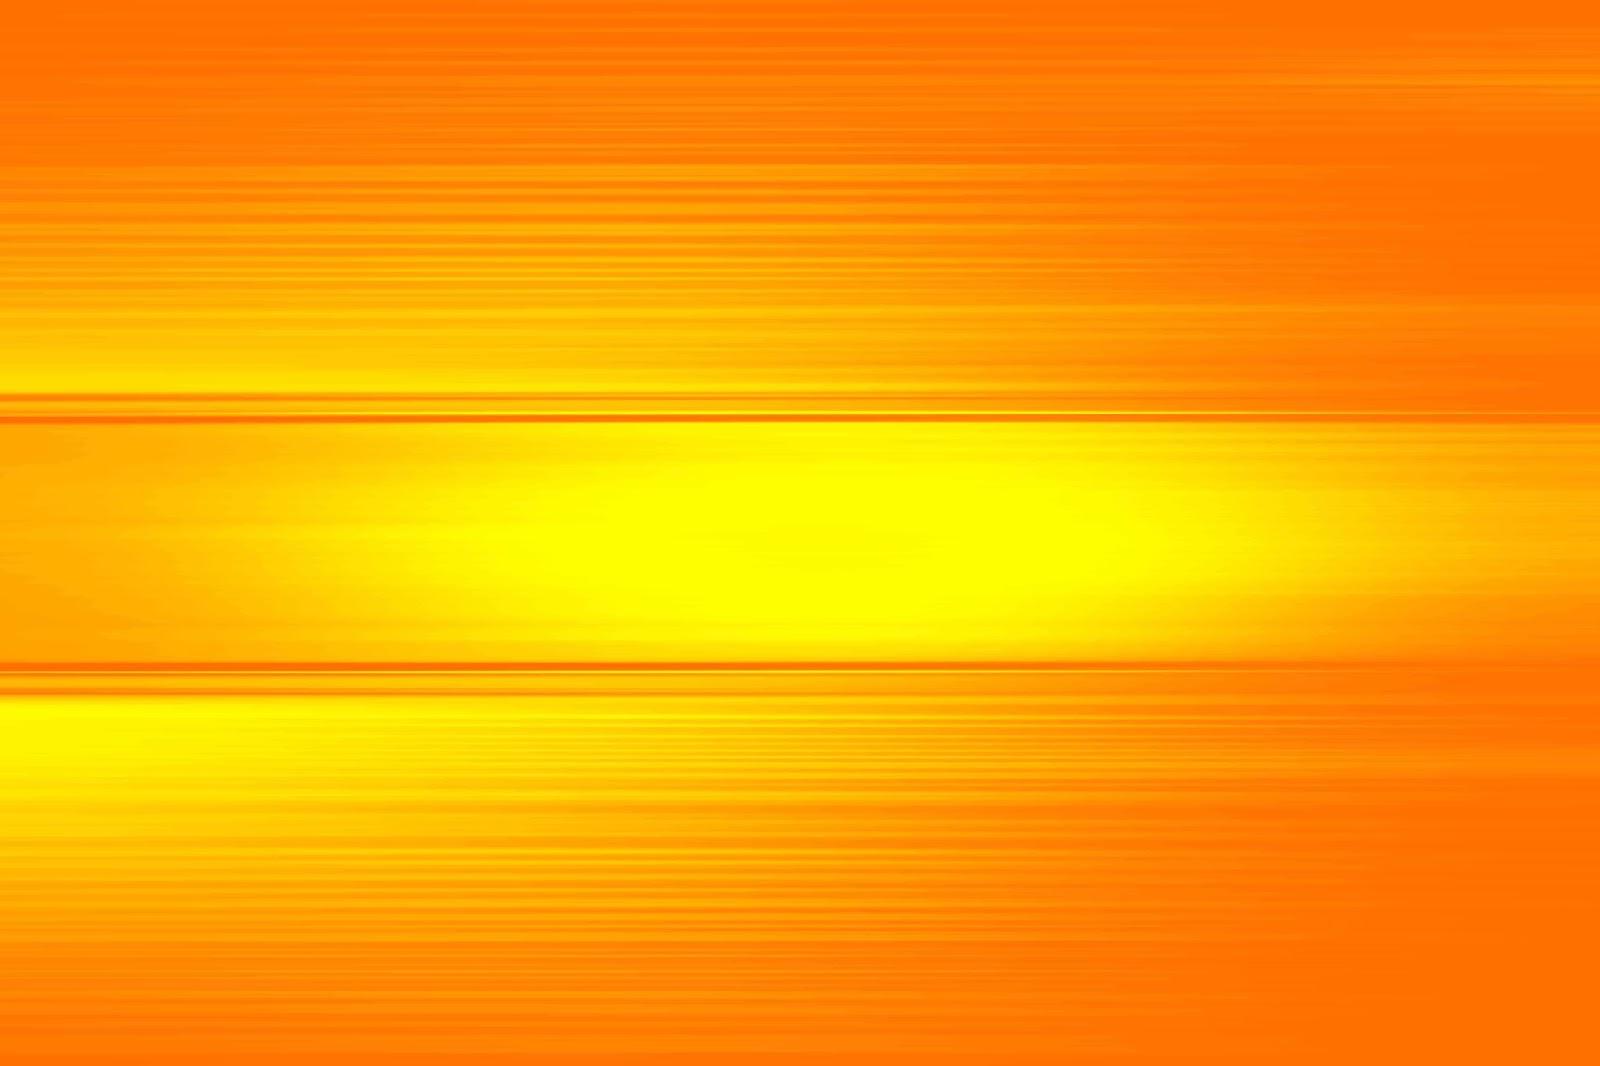 abstract orange hd wallpaper freebek